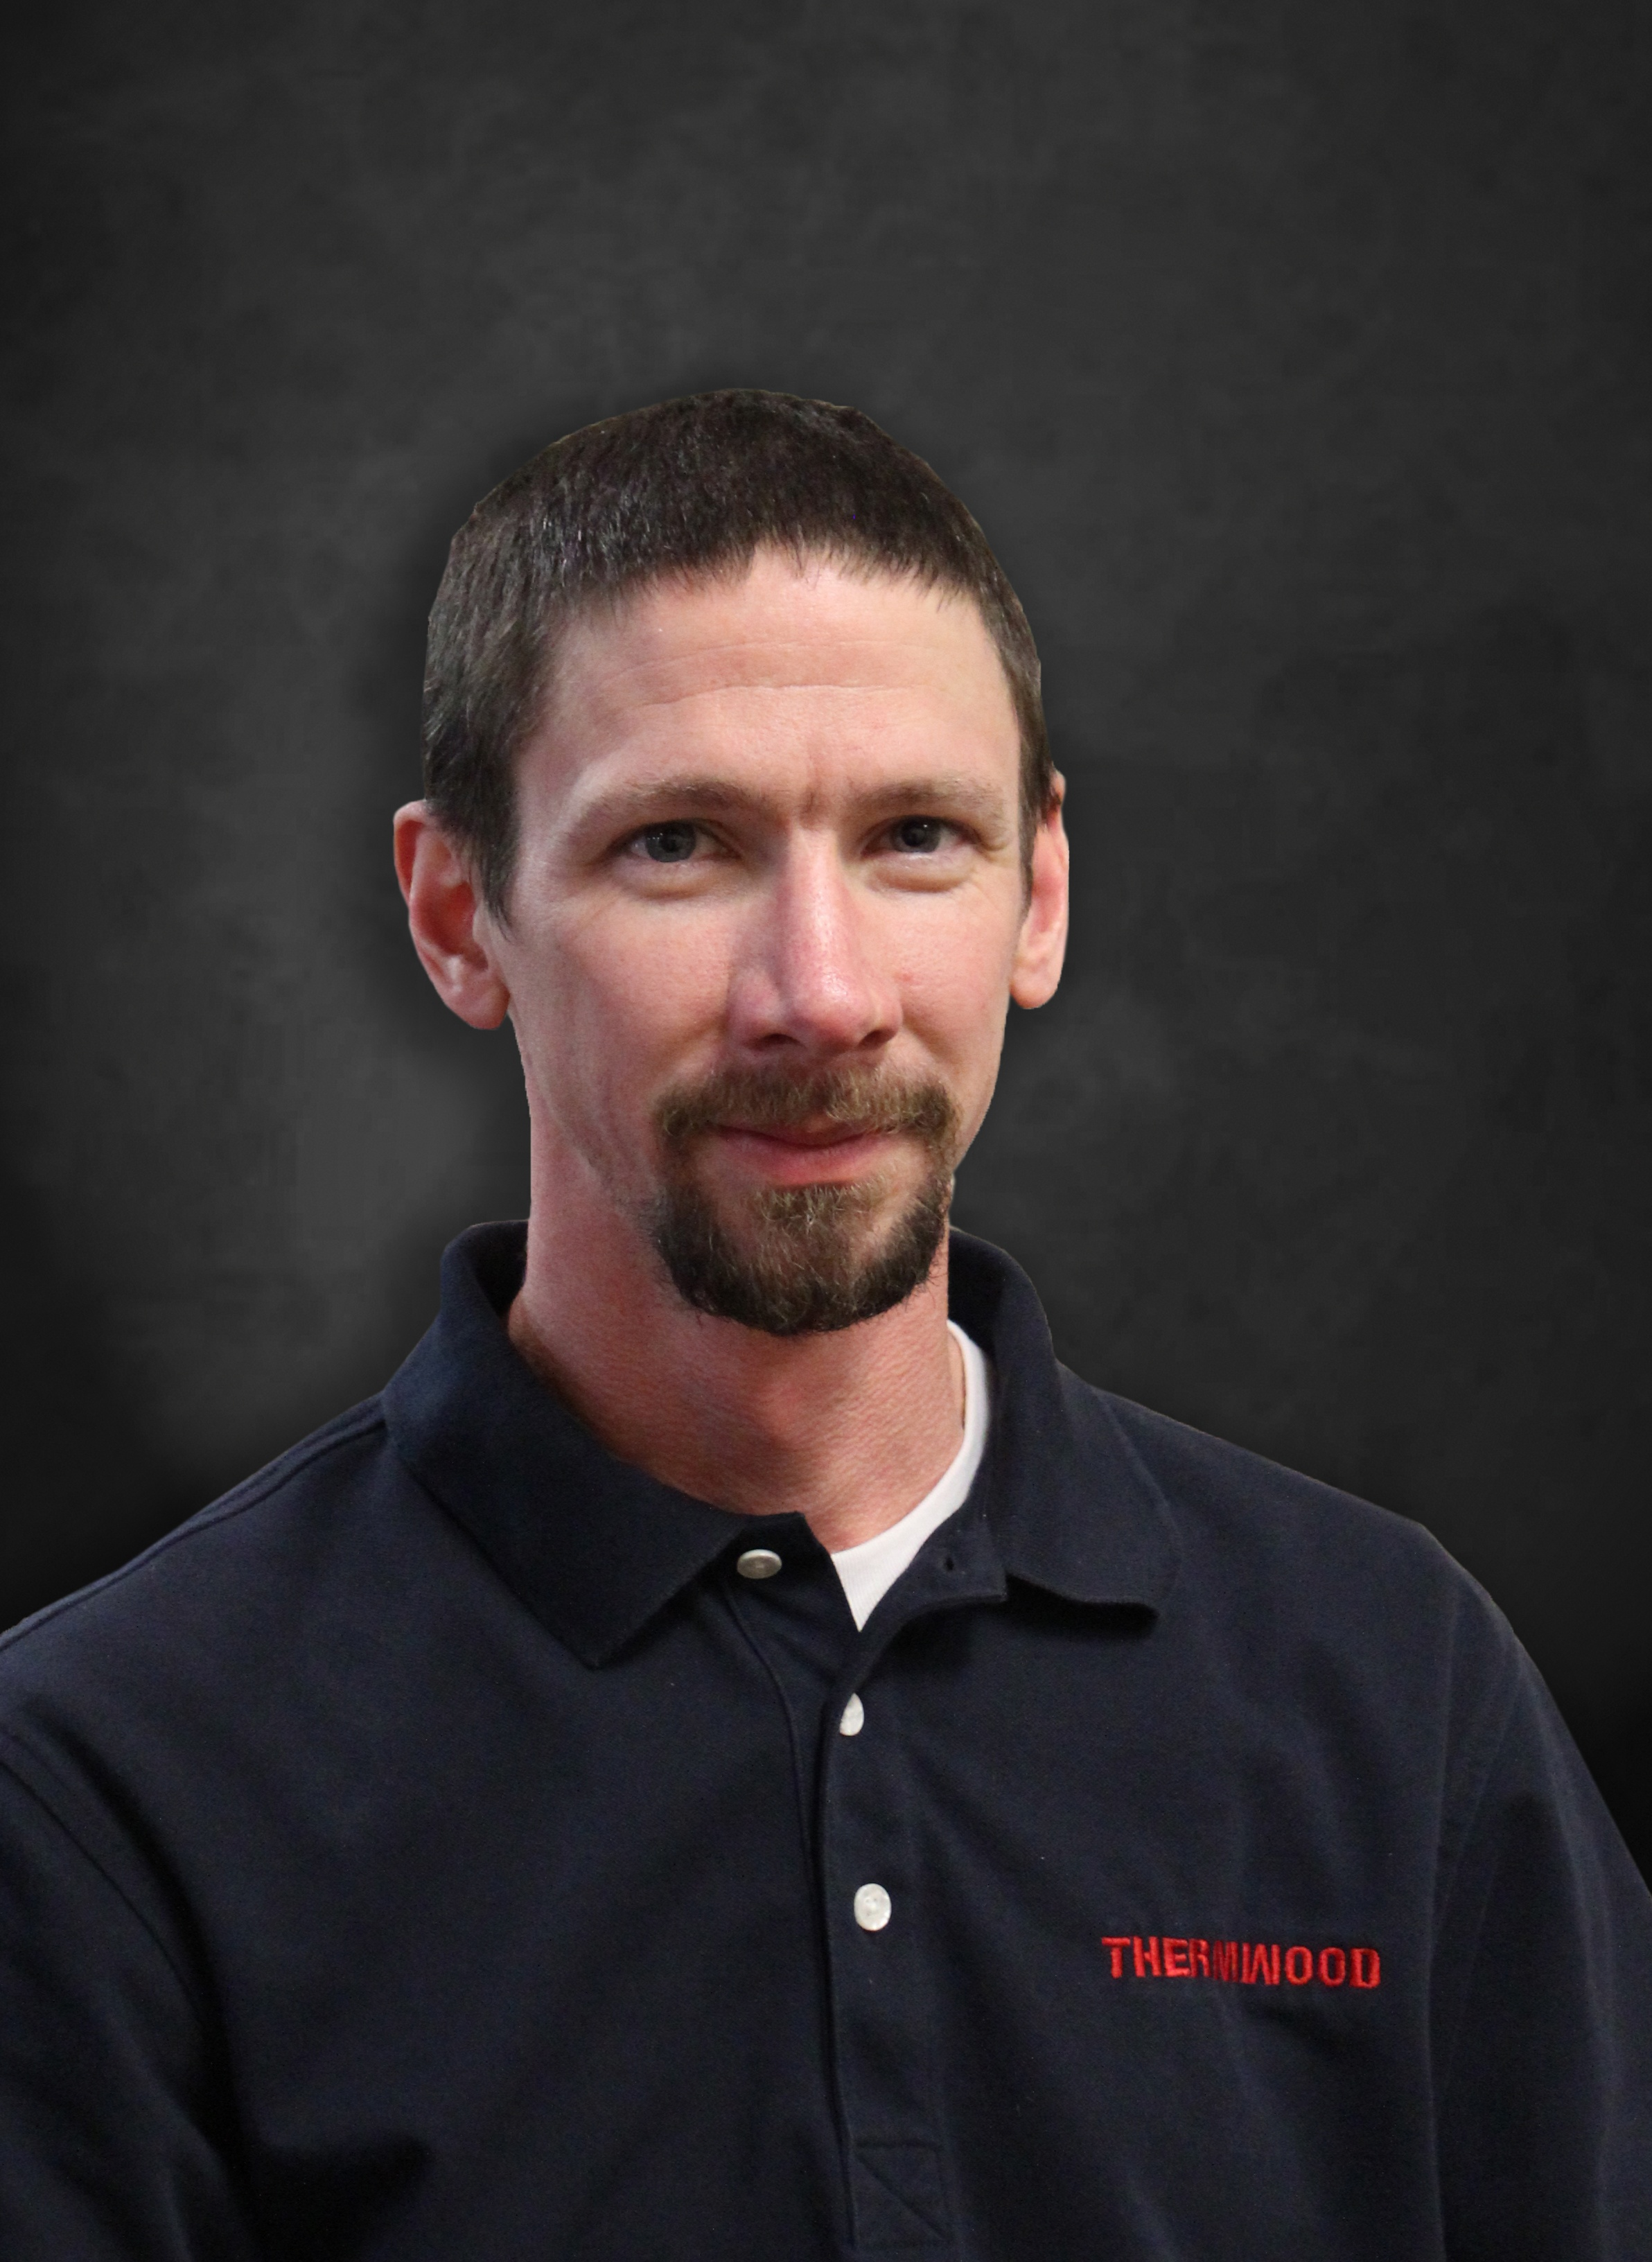 Thermwood Announces Logan Heeke as New Demonstration Technician